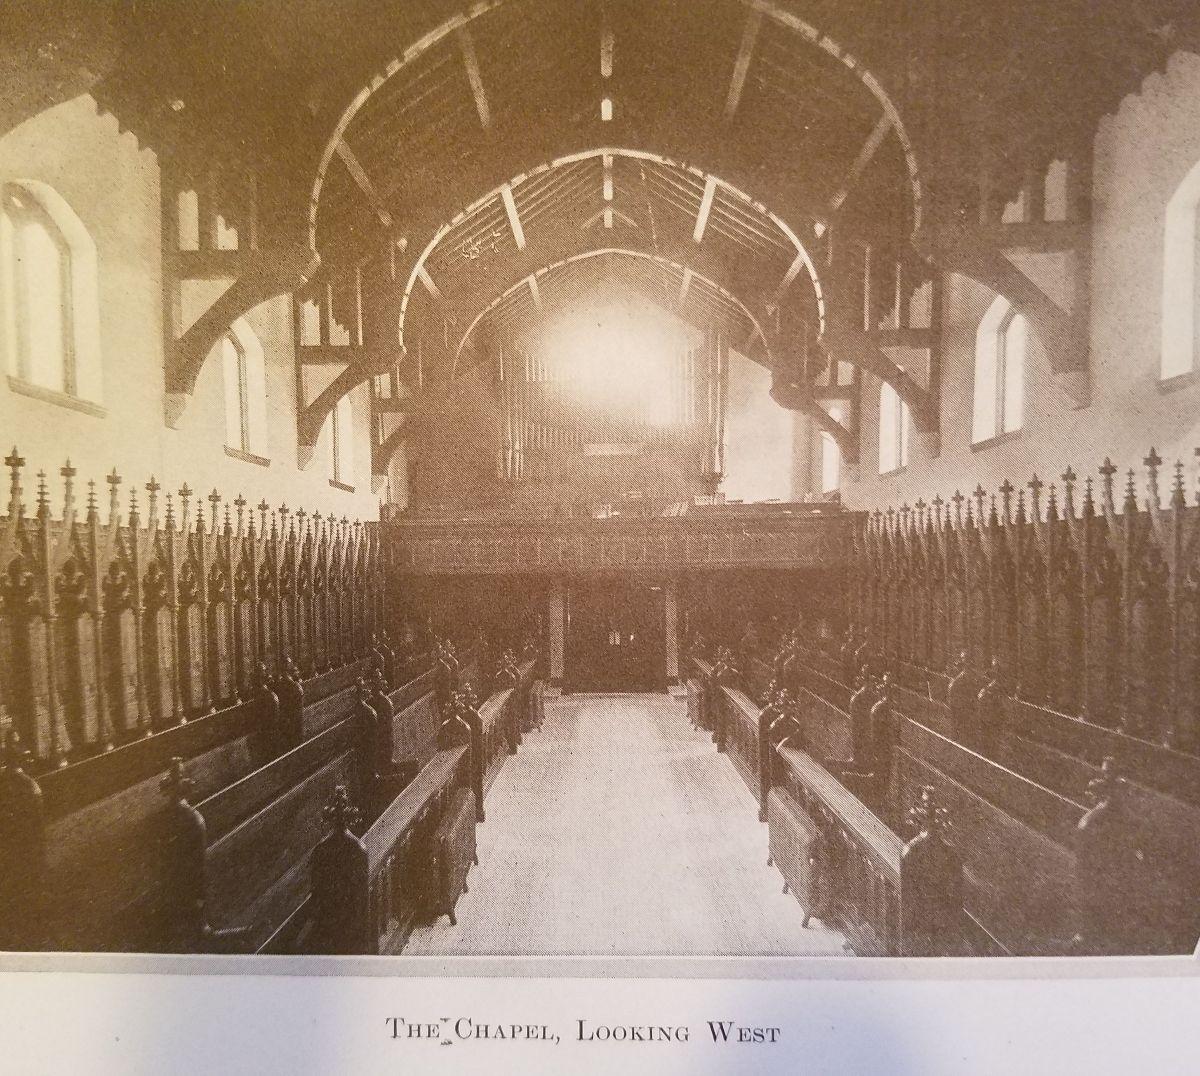 St. James Chapel, looking west